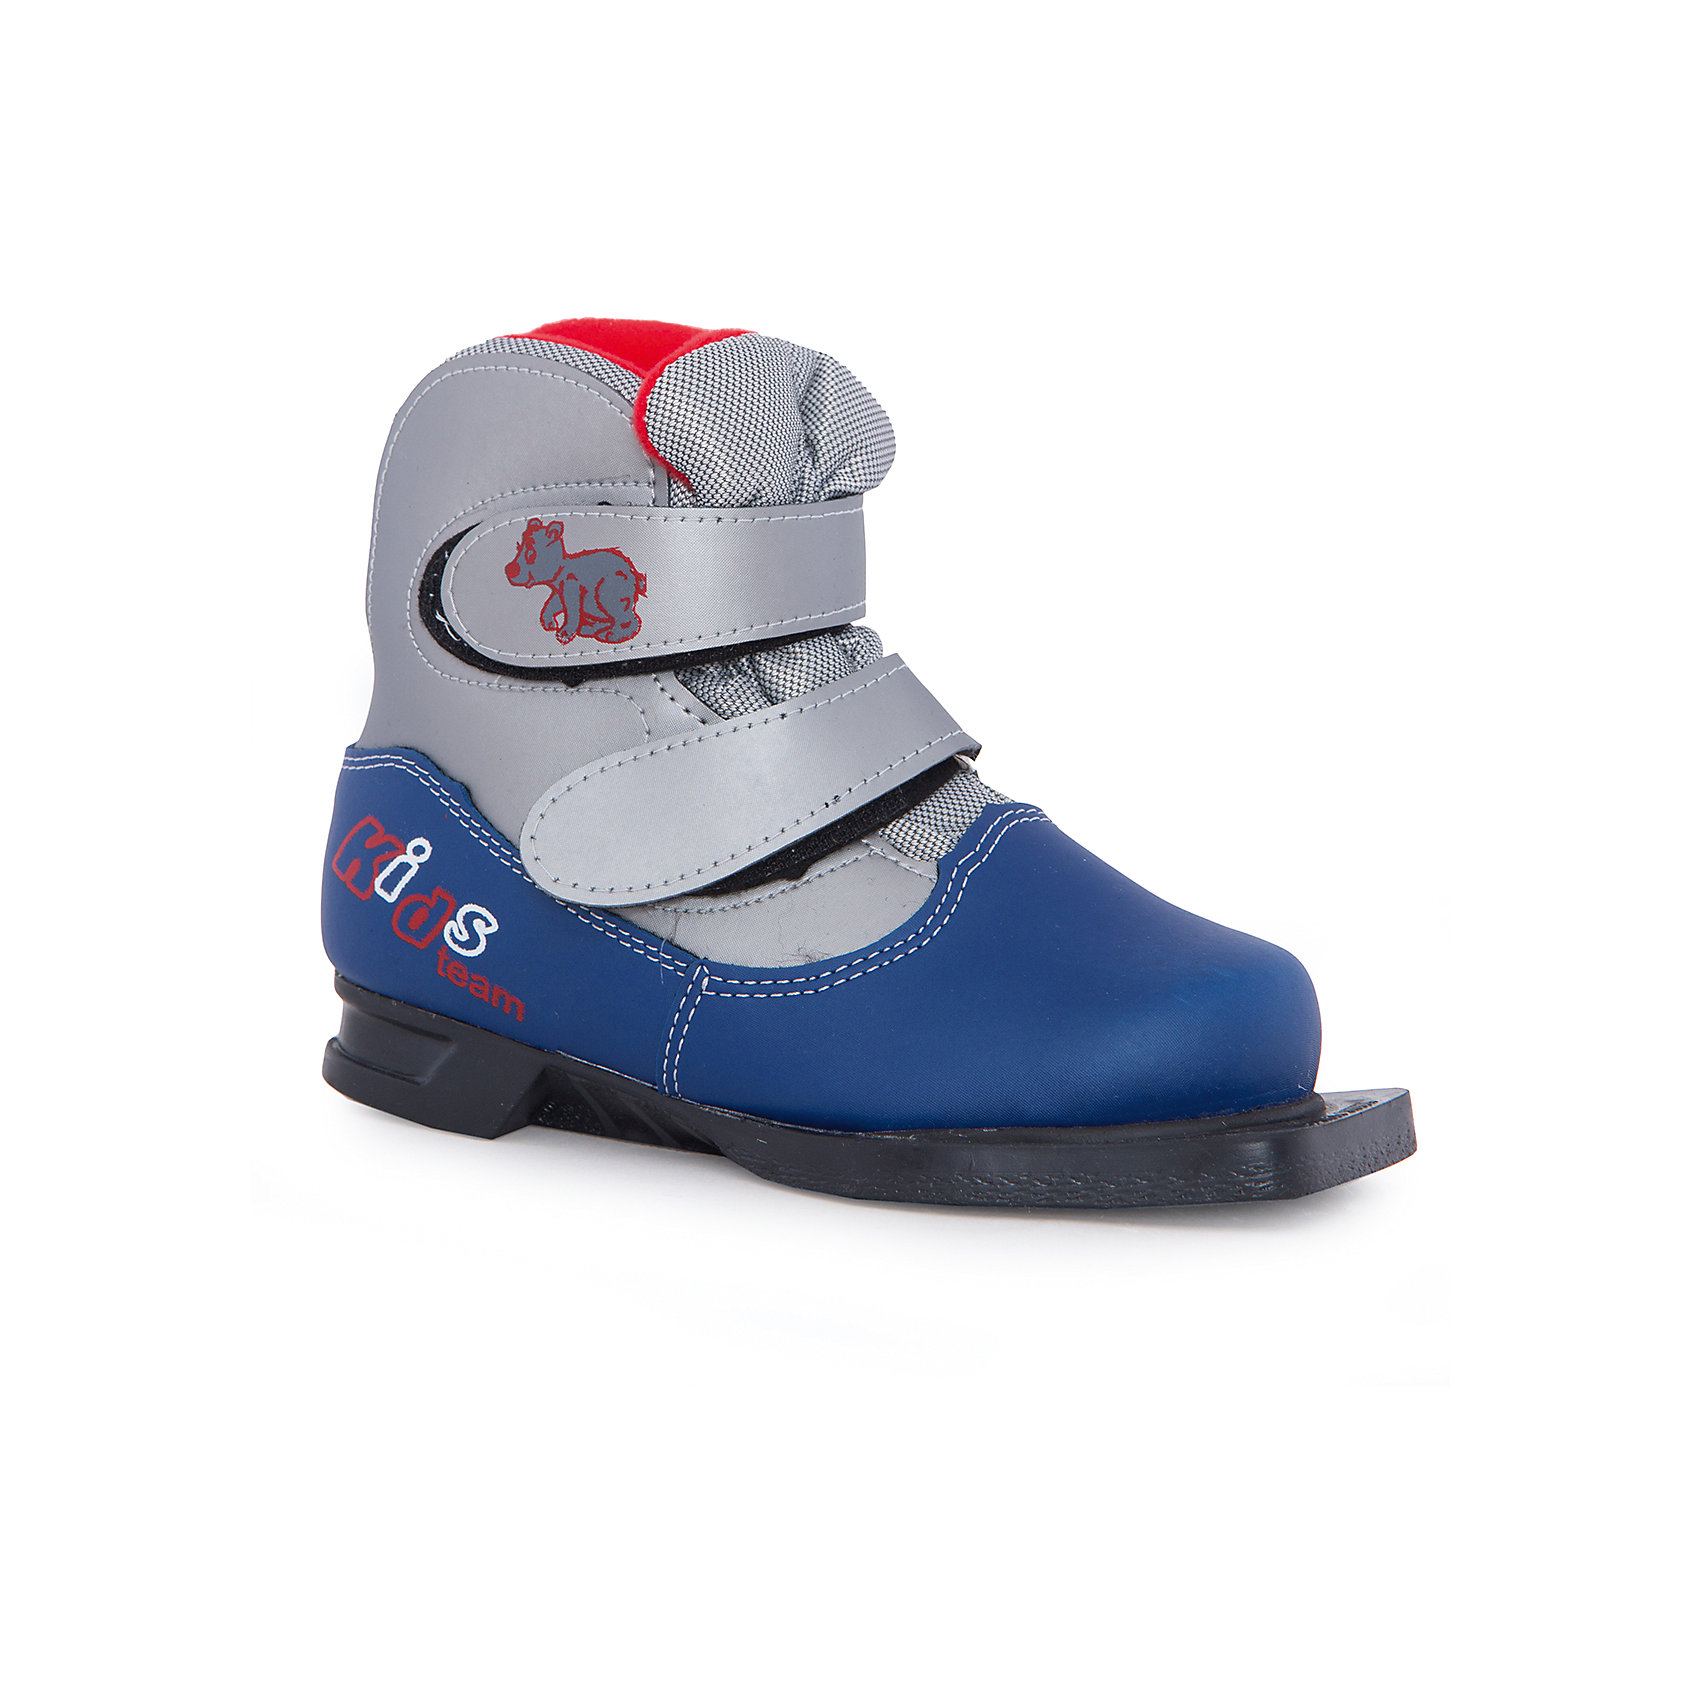 Ботинки лыжные NN75, МАРАКС, синий-серебро